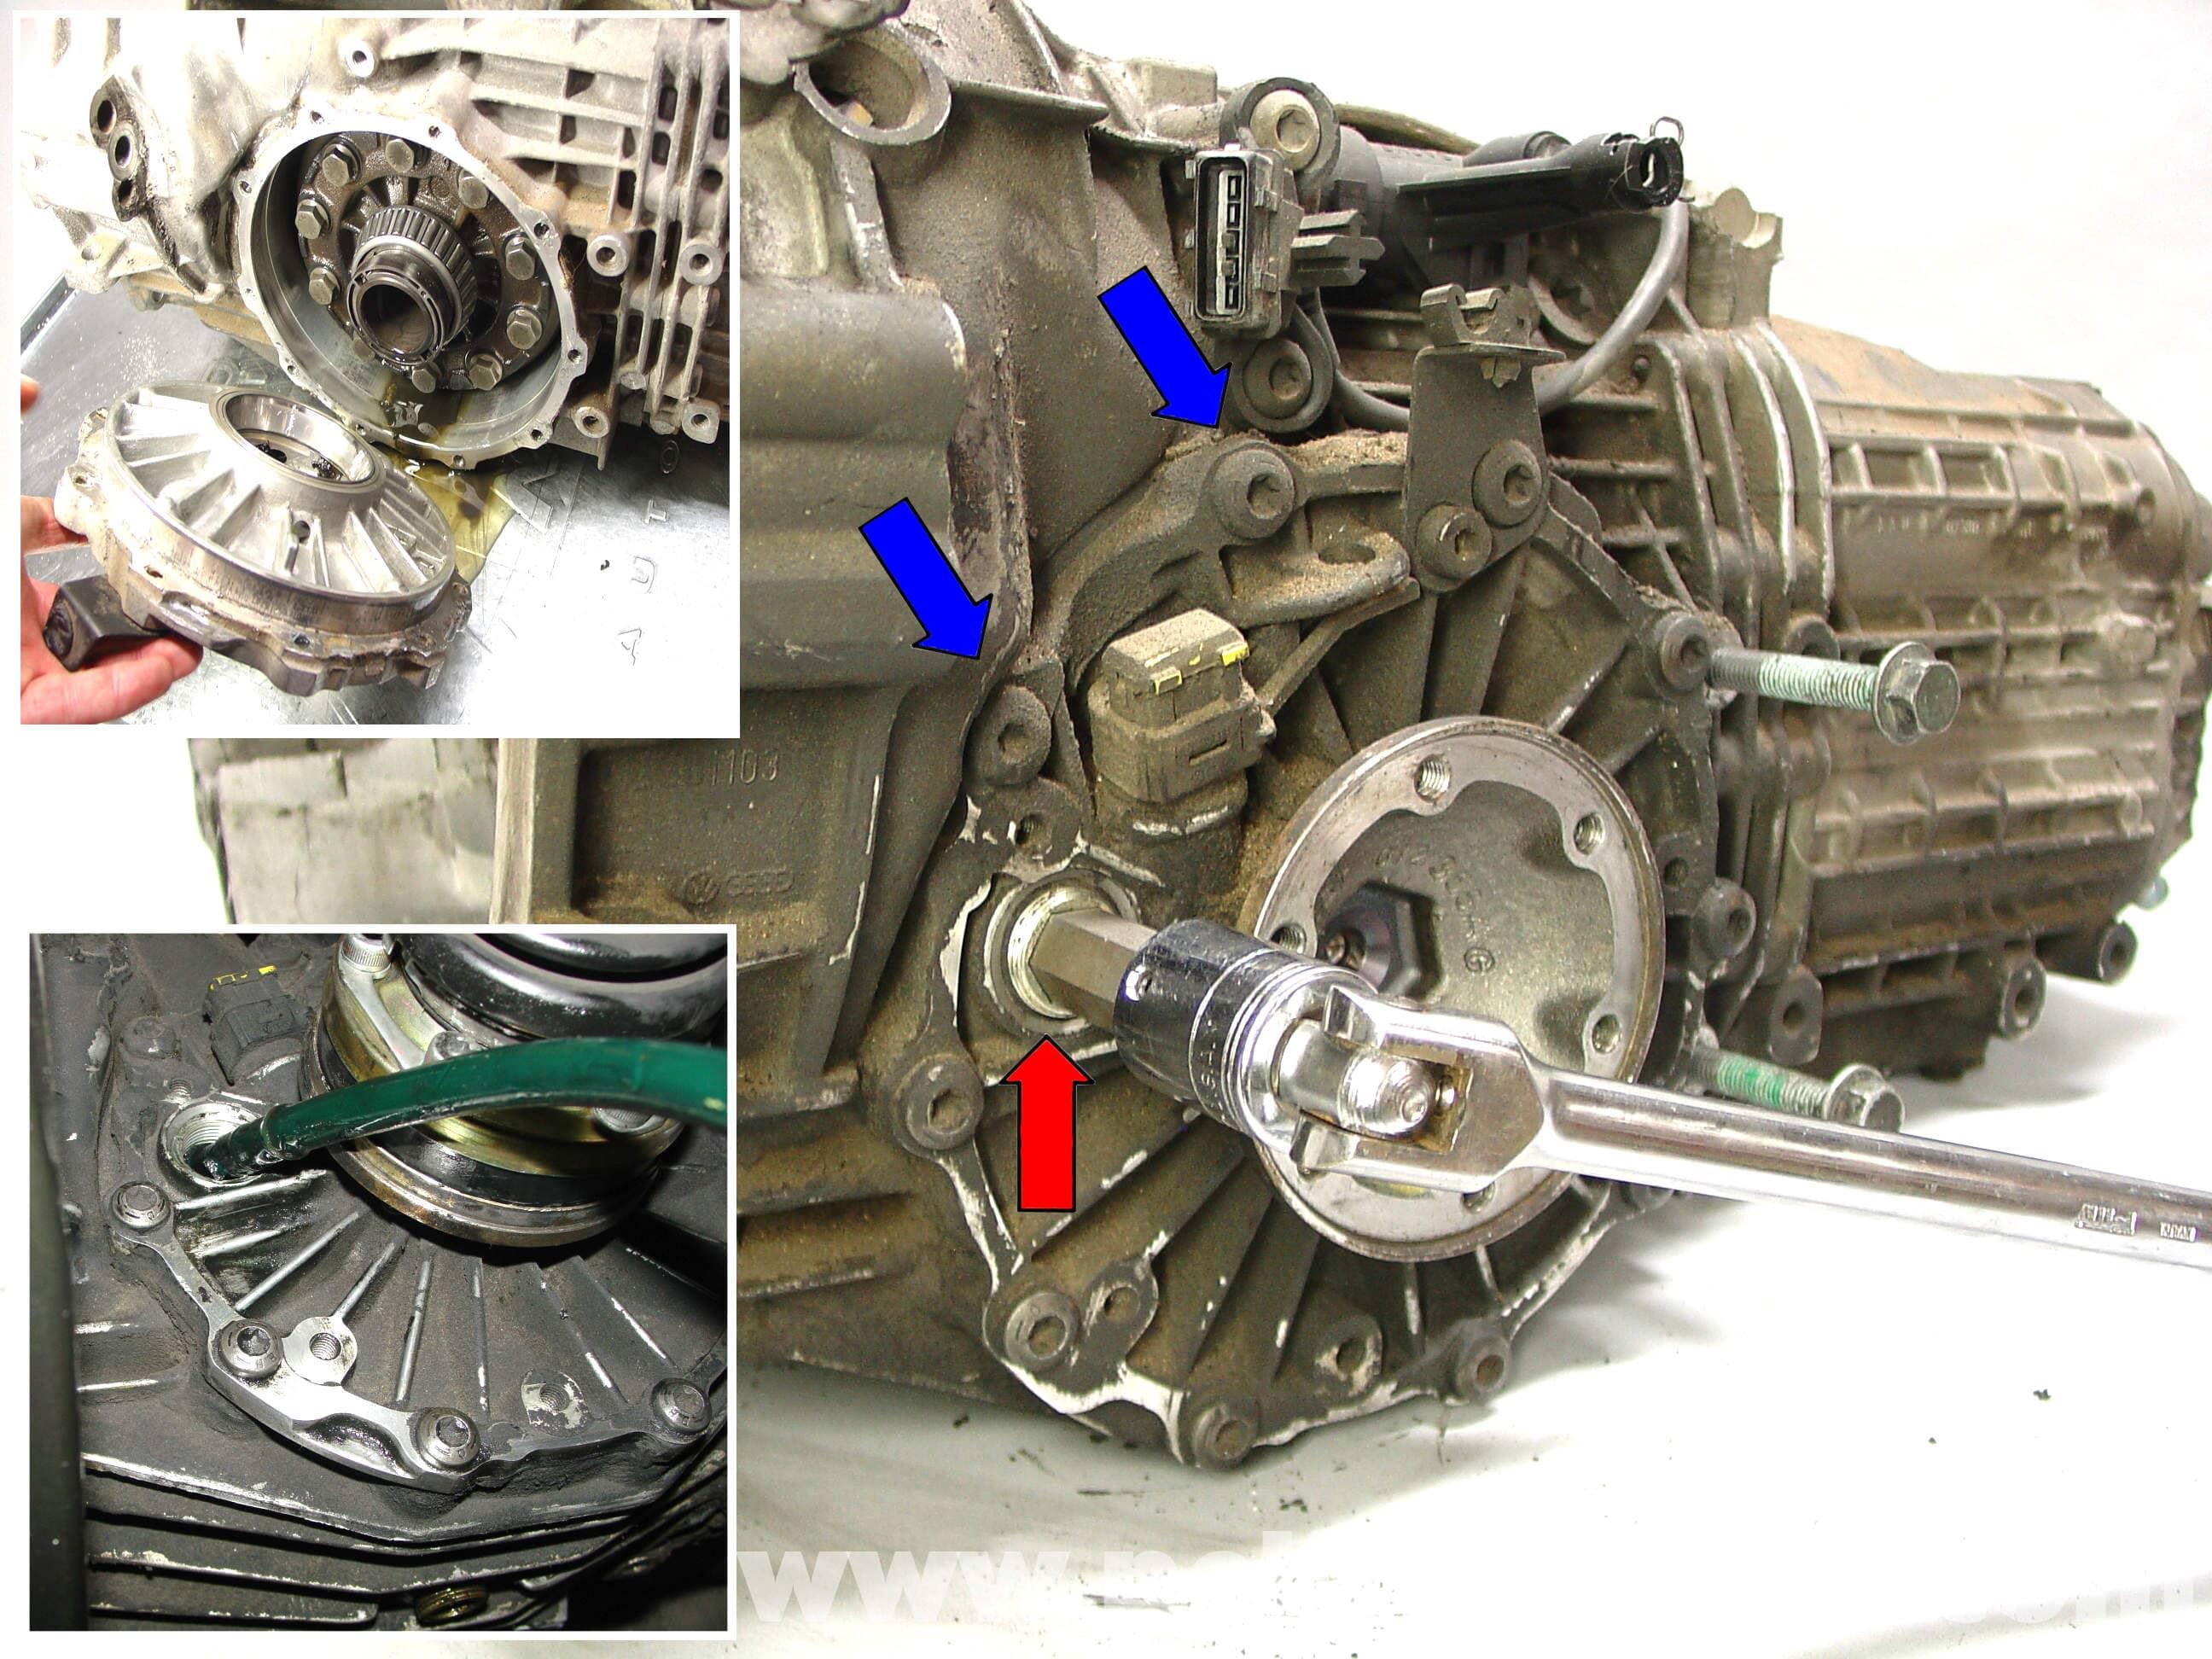 Porsche 911 Carrera Manual Transmission Fluid Replacement 996 1998 2005 997 2005 2012